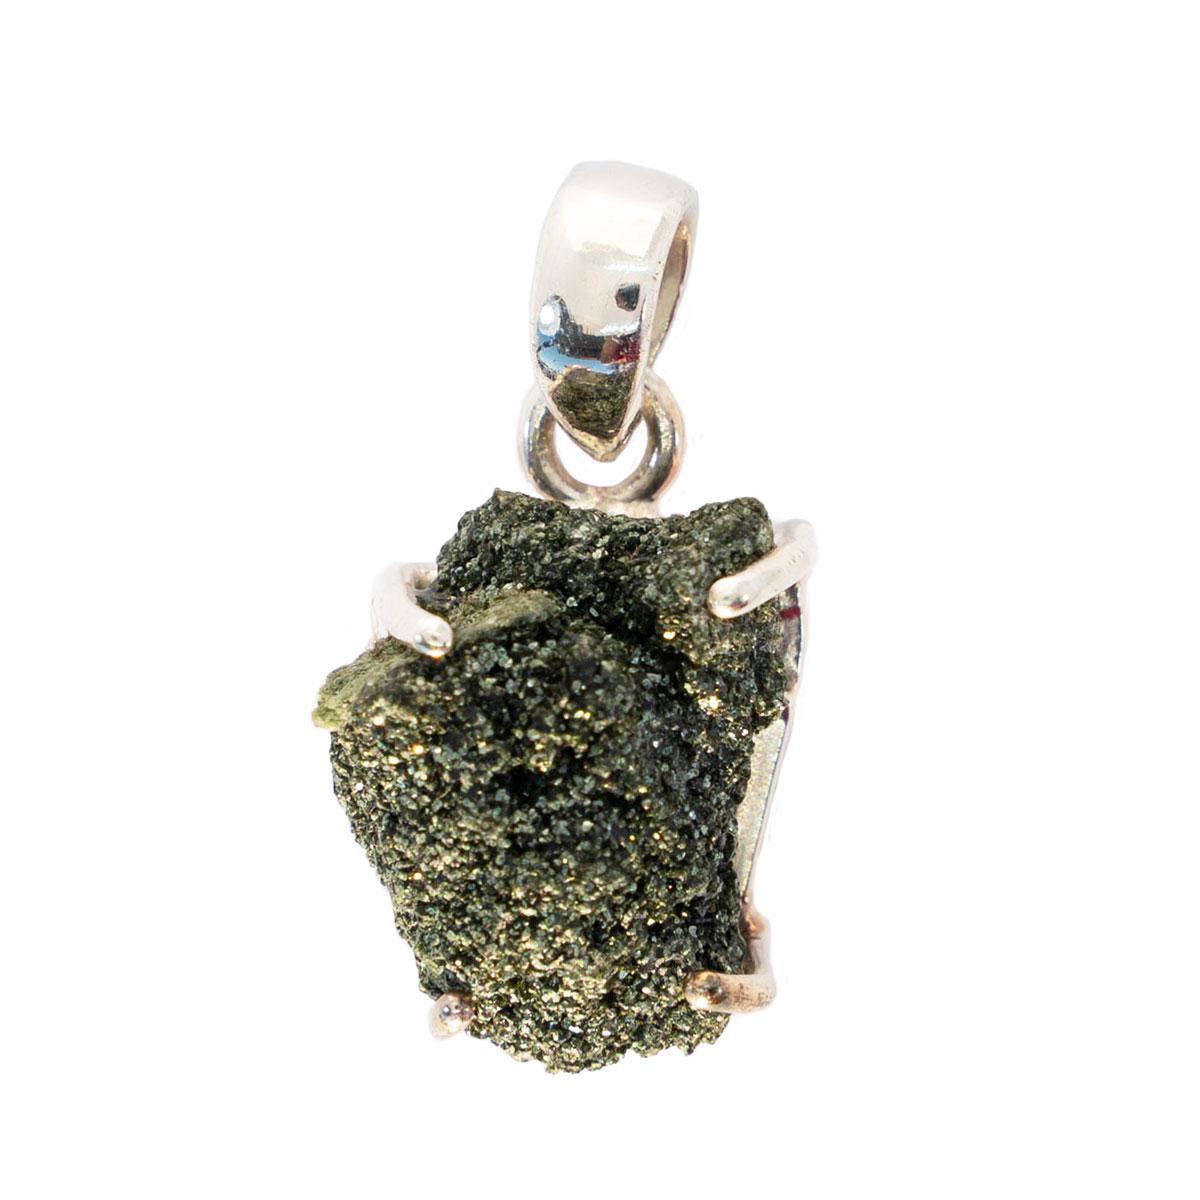 Sri Avinash Infused™ 11cts Green Seraphinite In Quartz Pendant in Sterling Silver - Divine Spirit & Protection Infusion